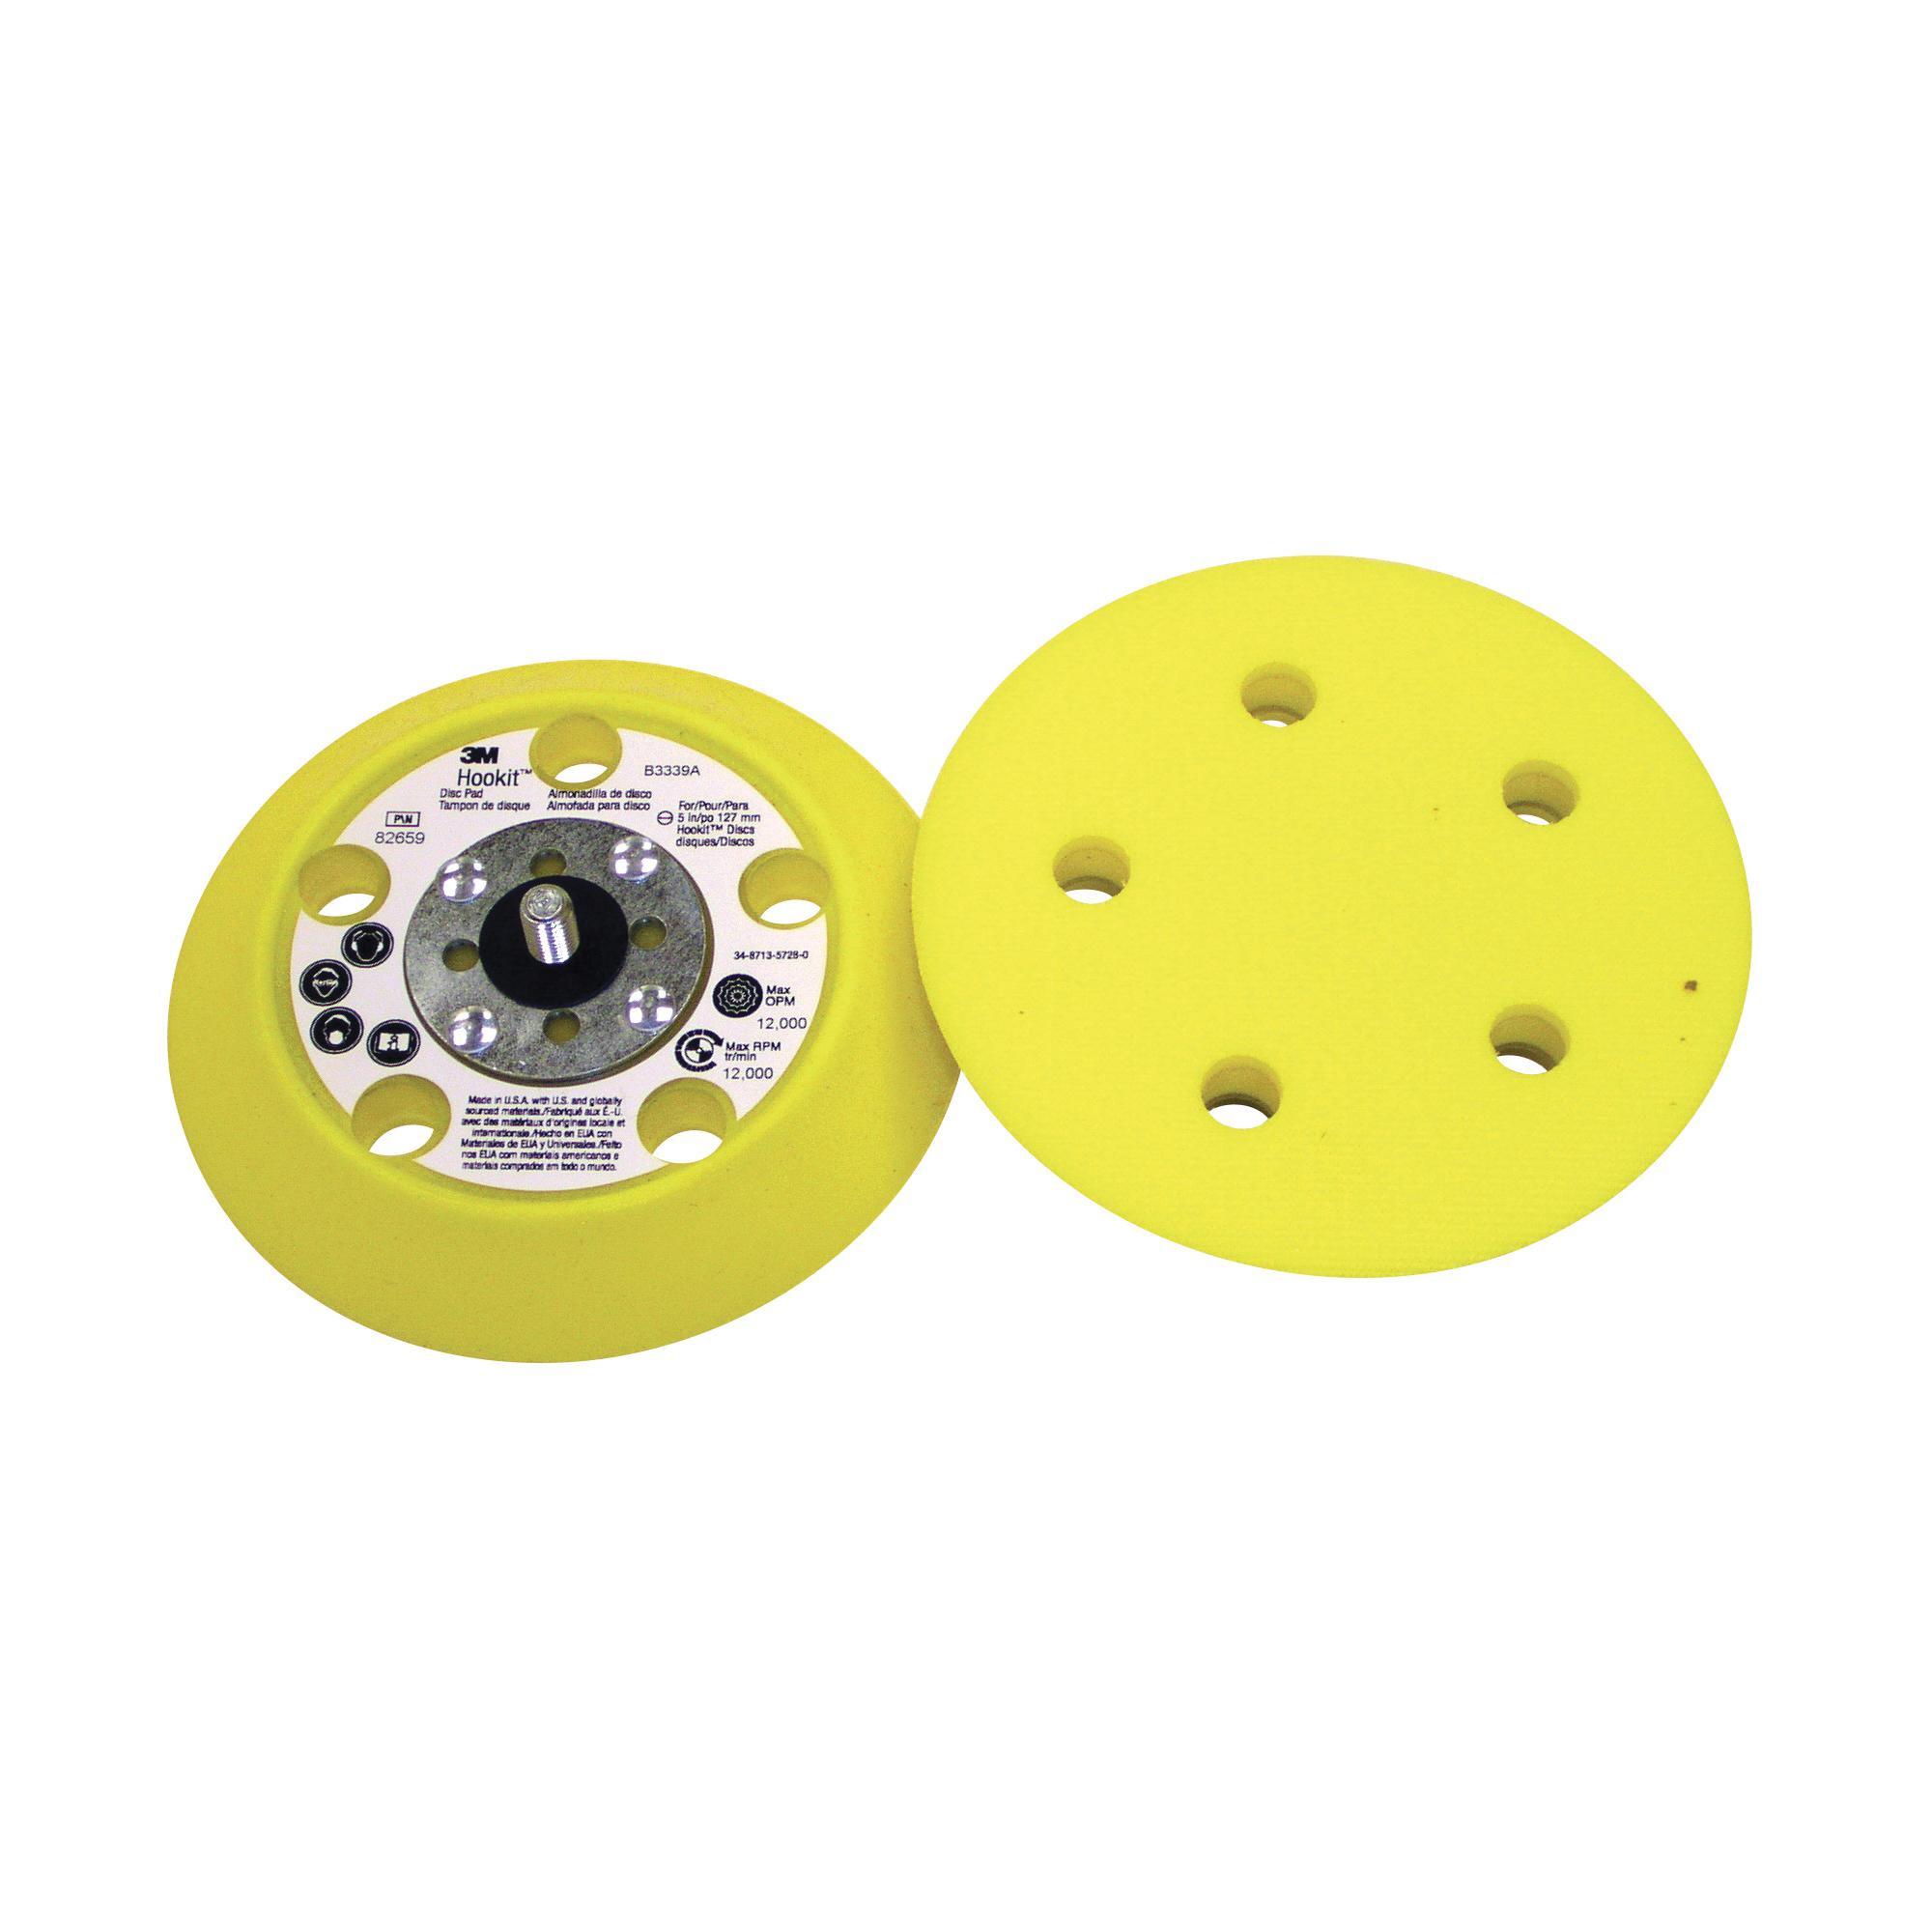 3M™ Hookit™ 051144-82659 General Purpose Medium Density Disc Pad, 5 in Dia Pad, 3M™ Hookit™ Attachment